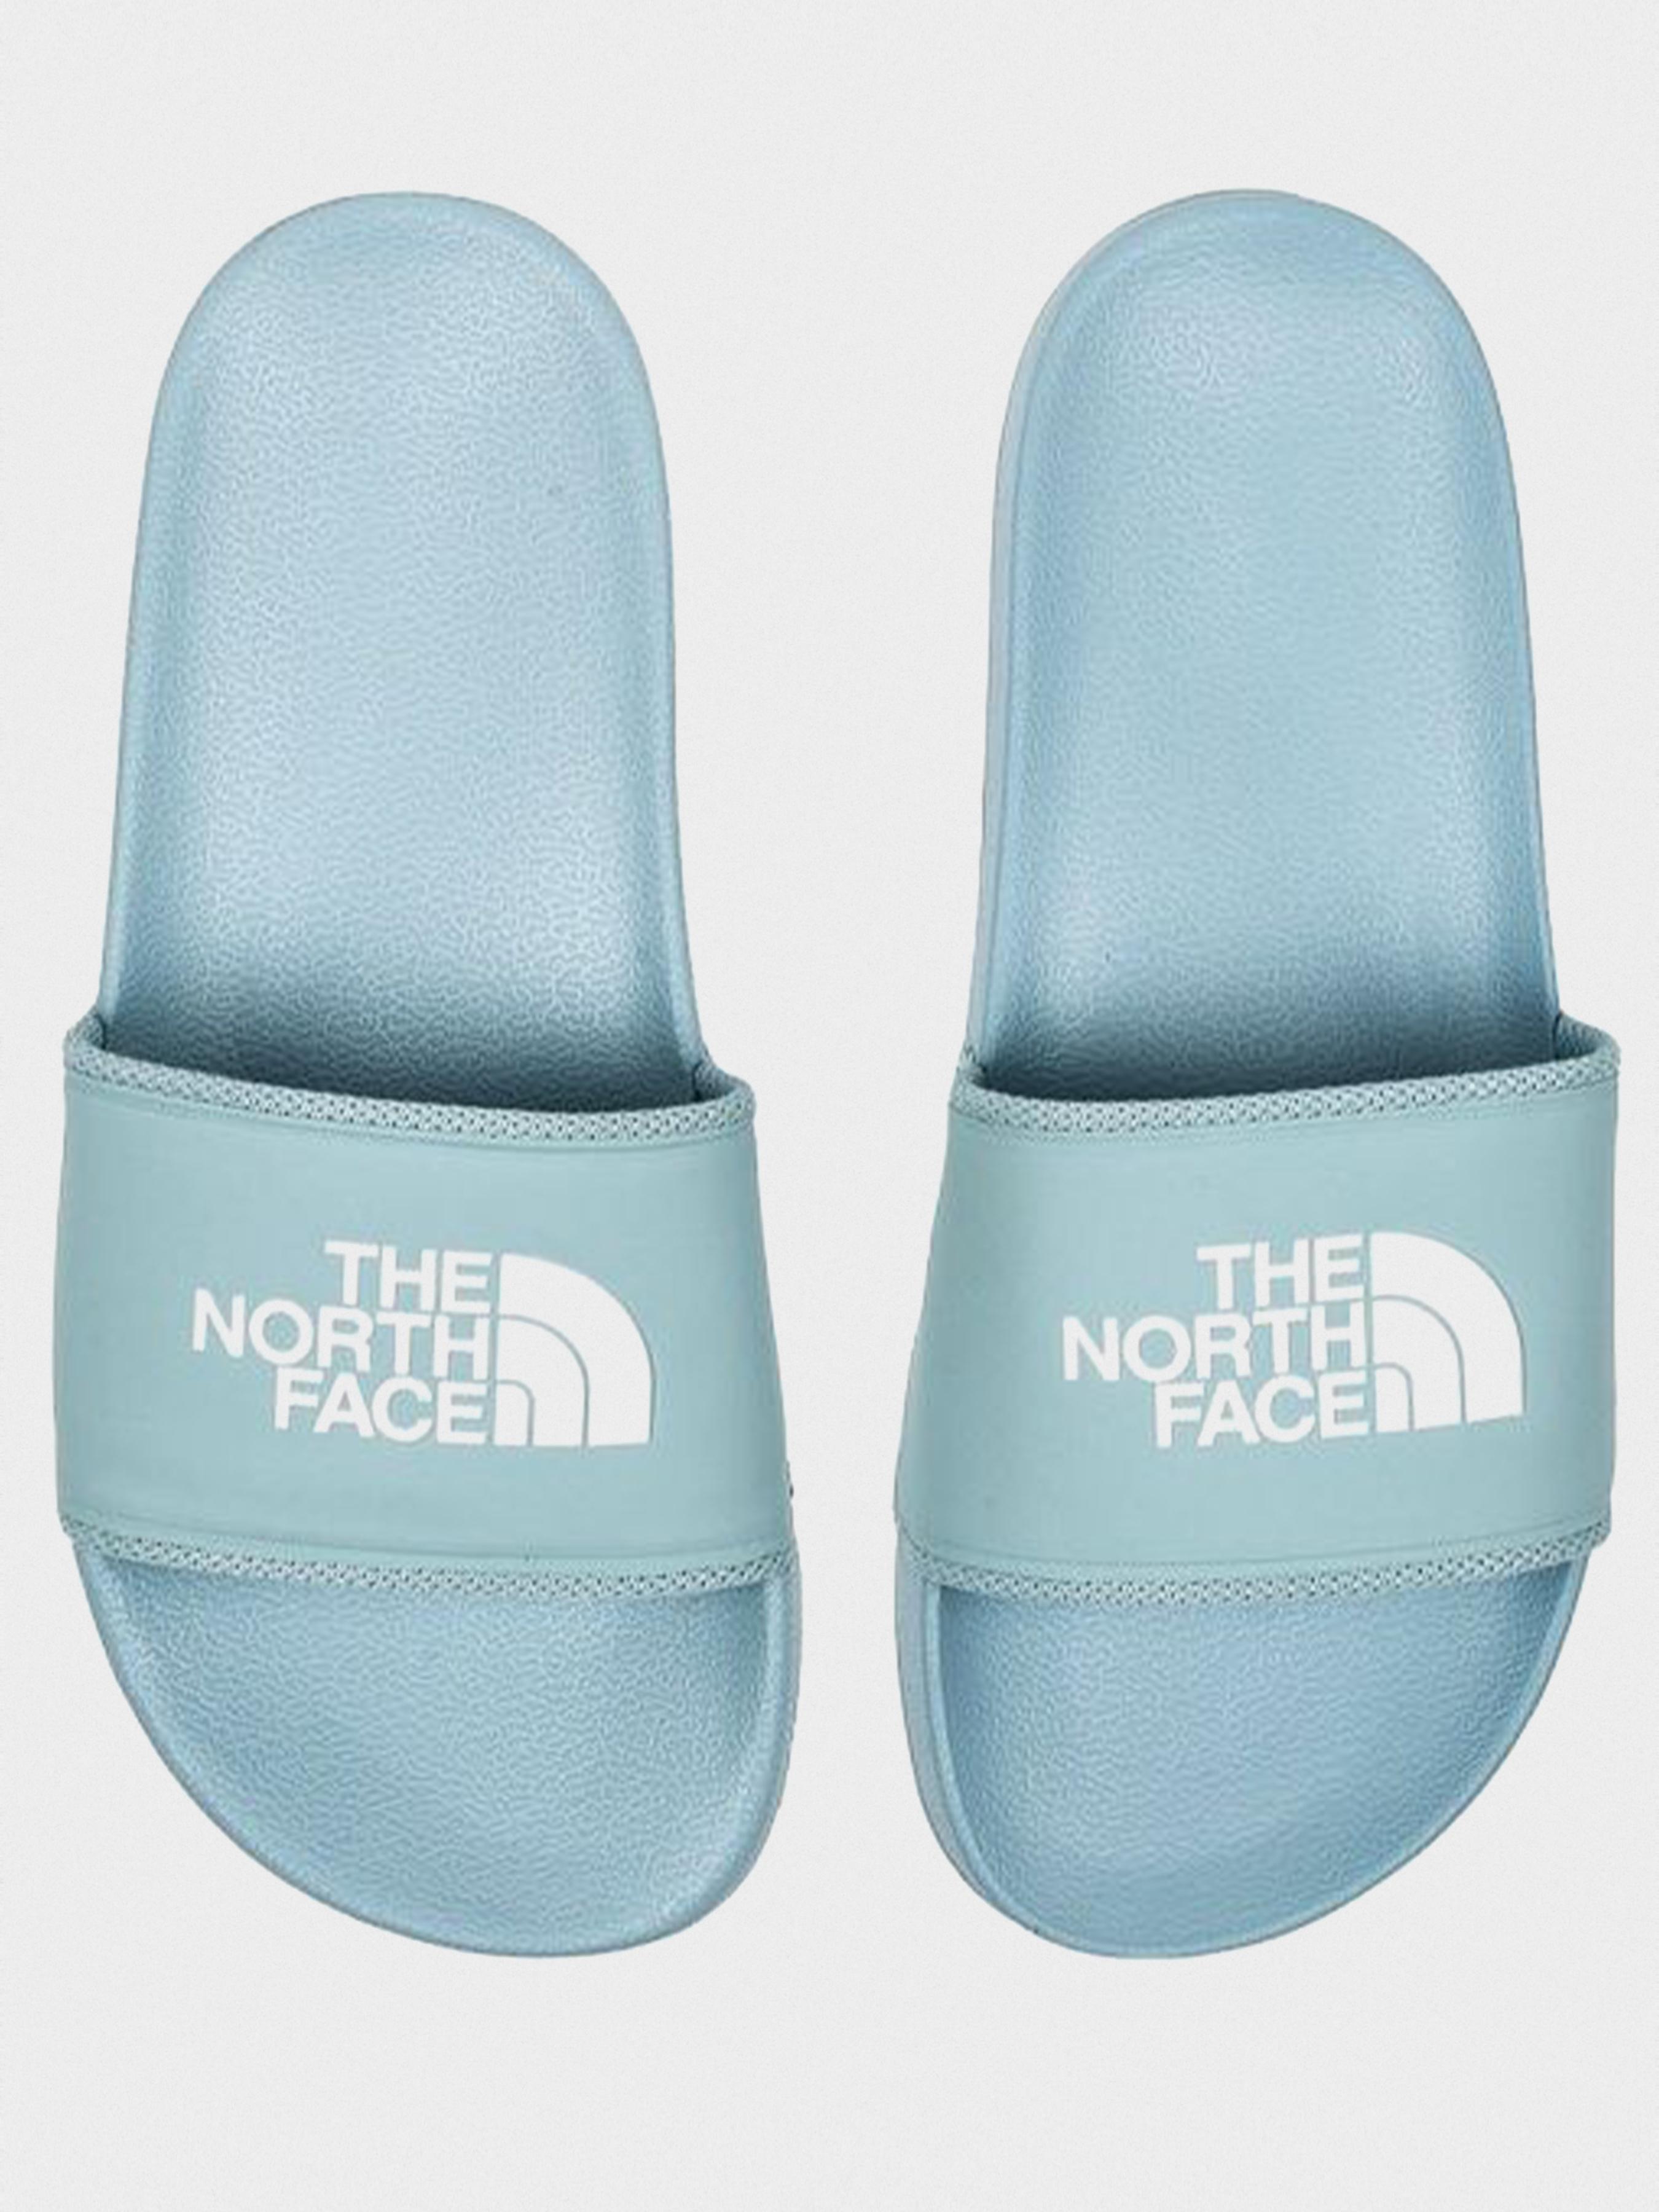 Купить Шлёпанцы женские The North Face BC SLIDE II NO9728, Бирюзовый